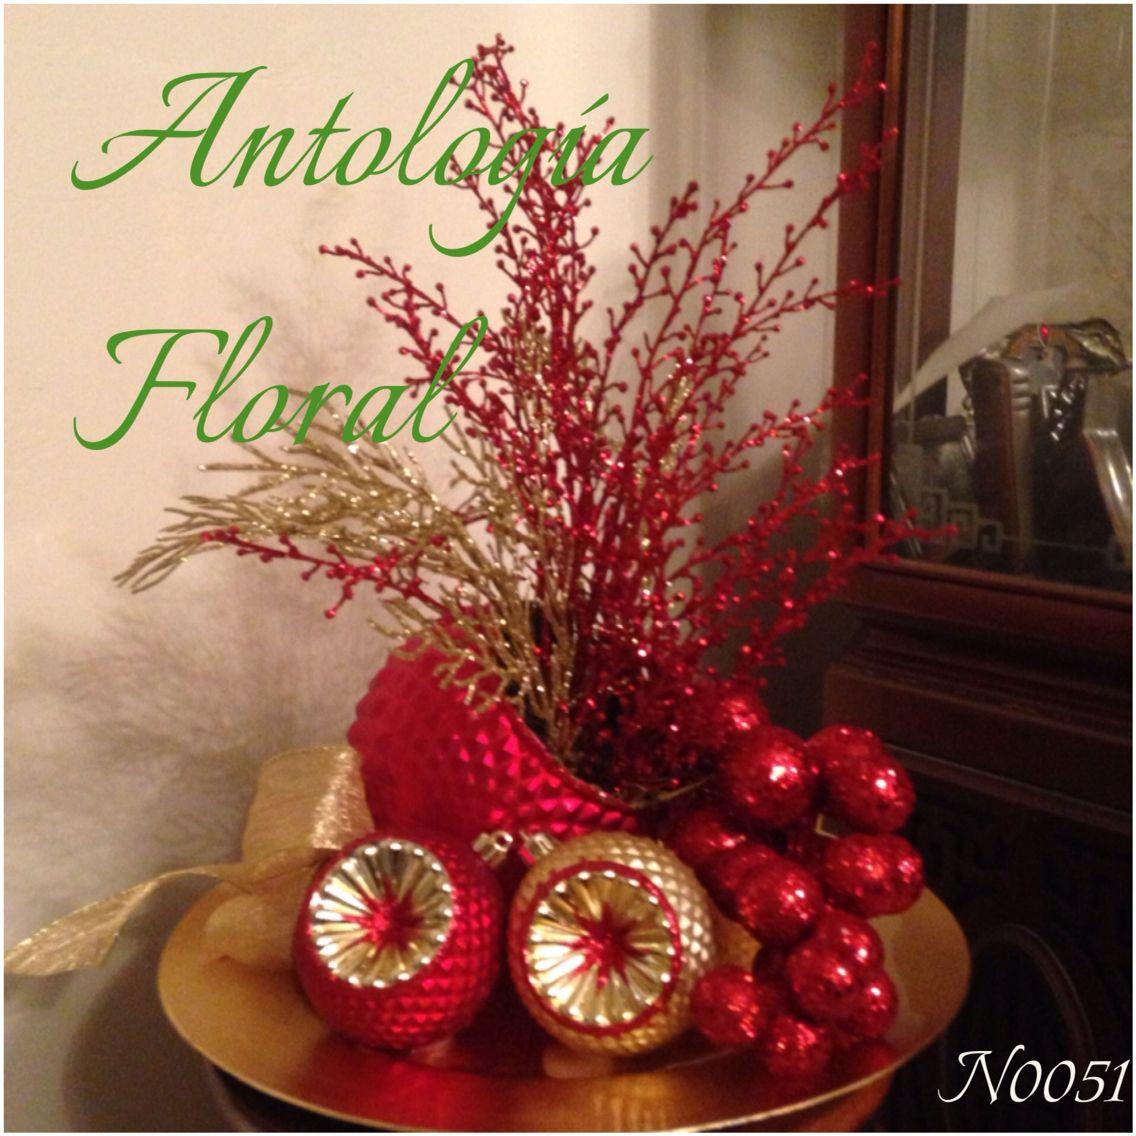 Centro de mesa navide o con base de esferas y racimo en for Arreglos navidenos para mesa